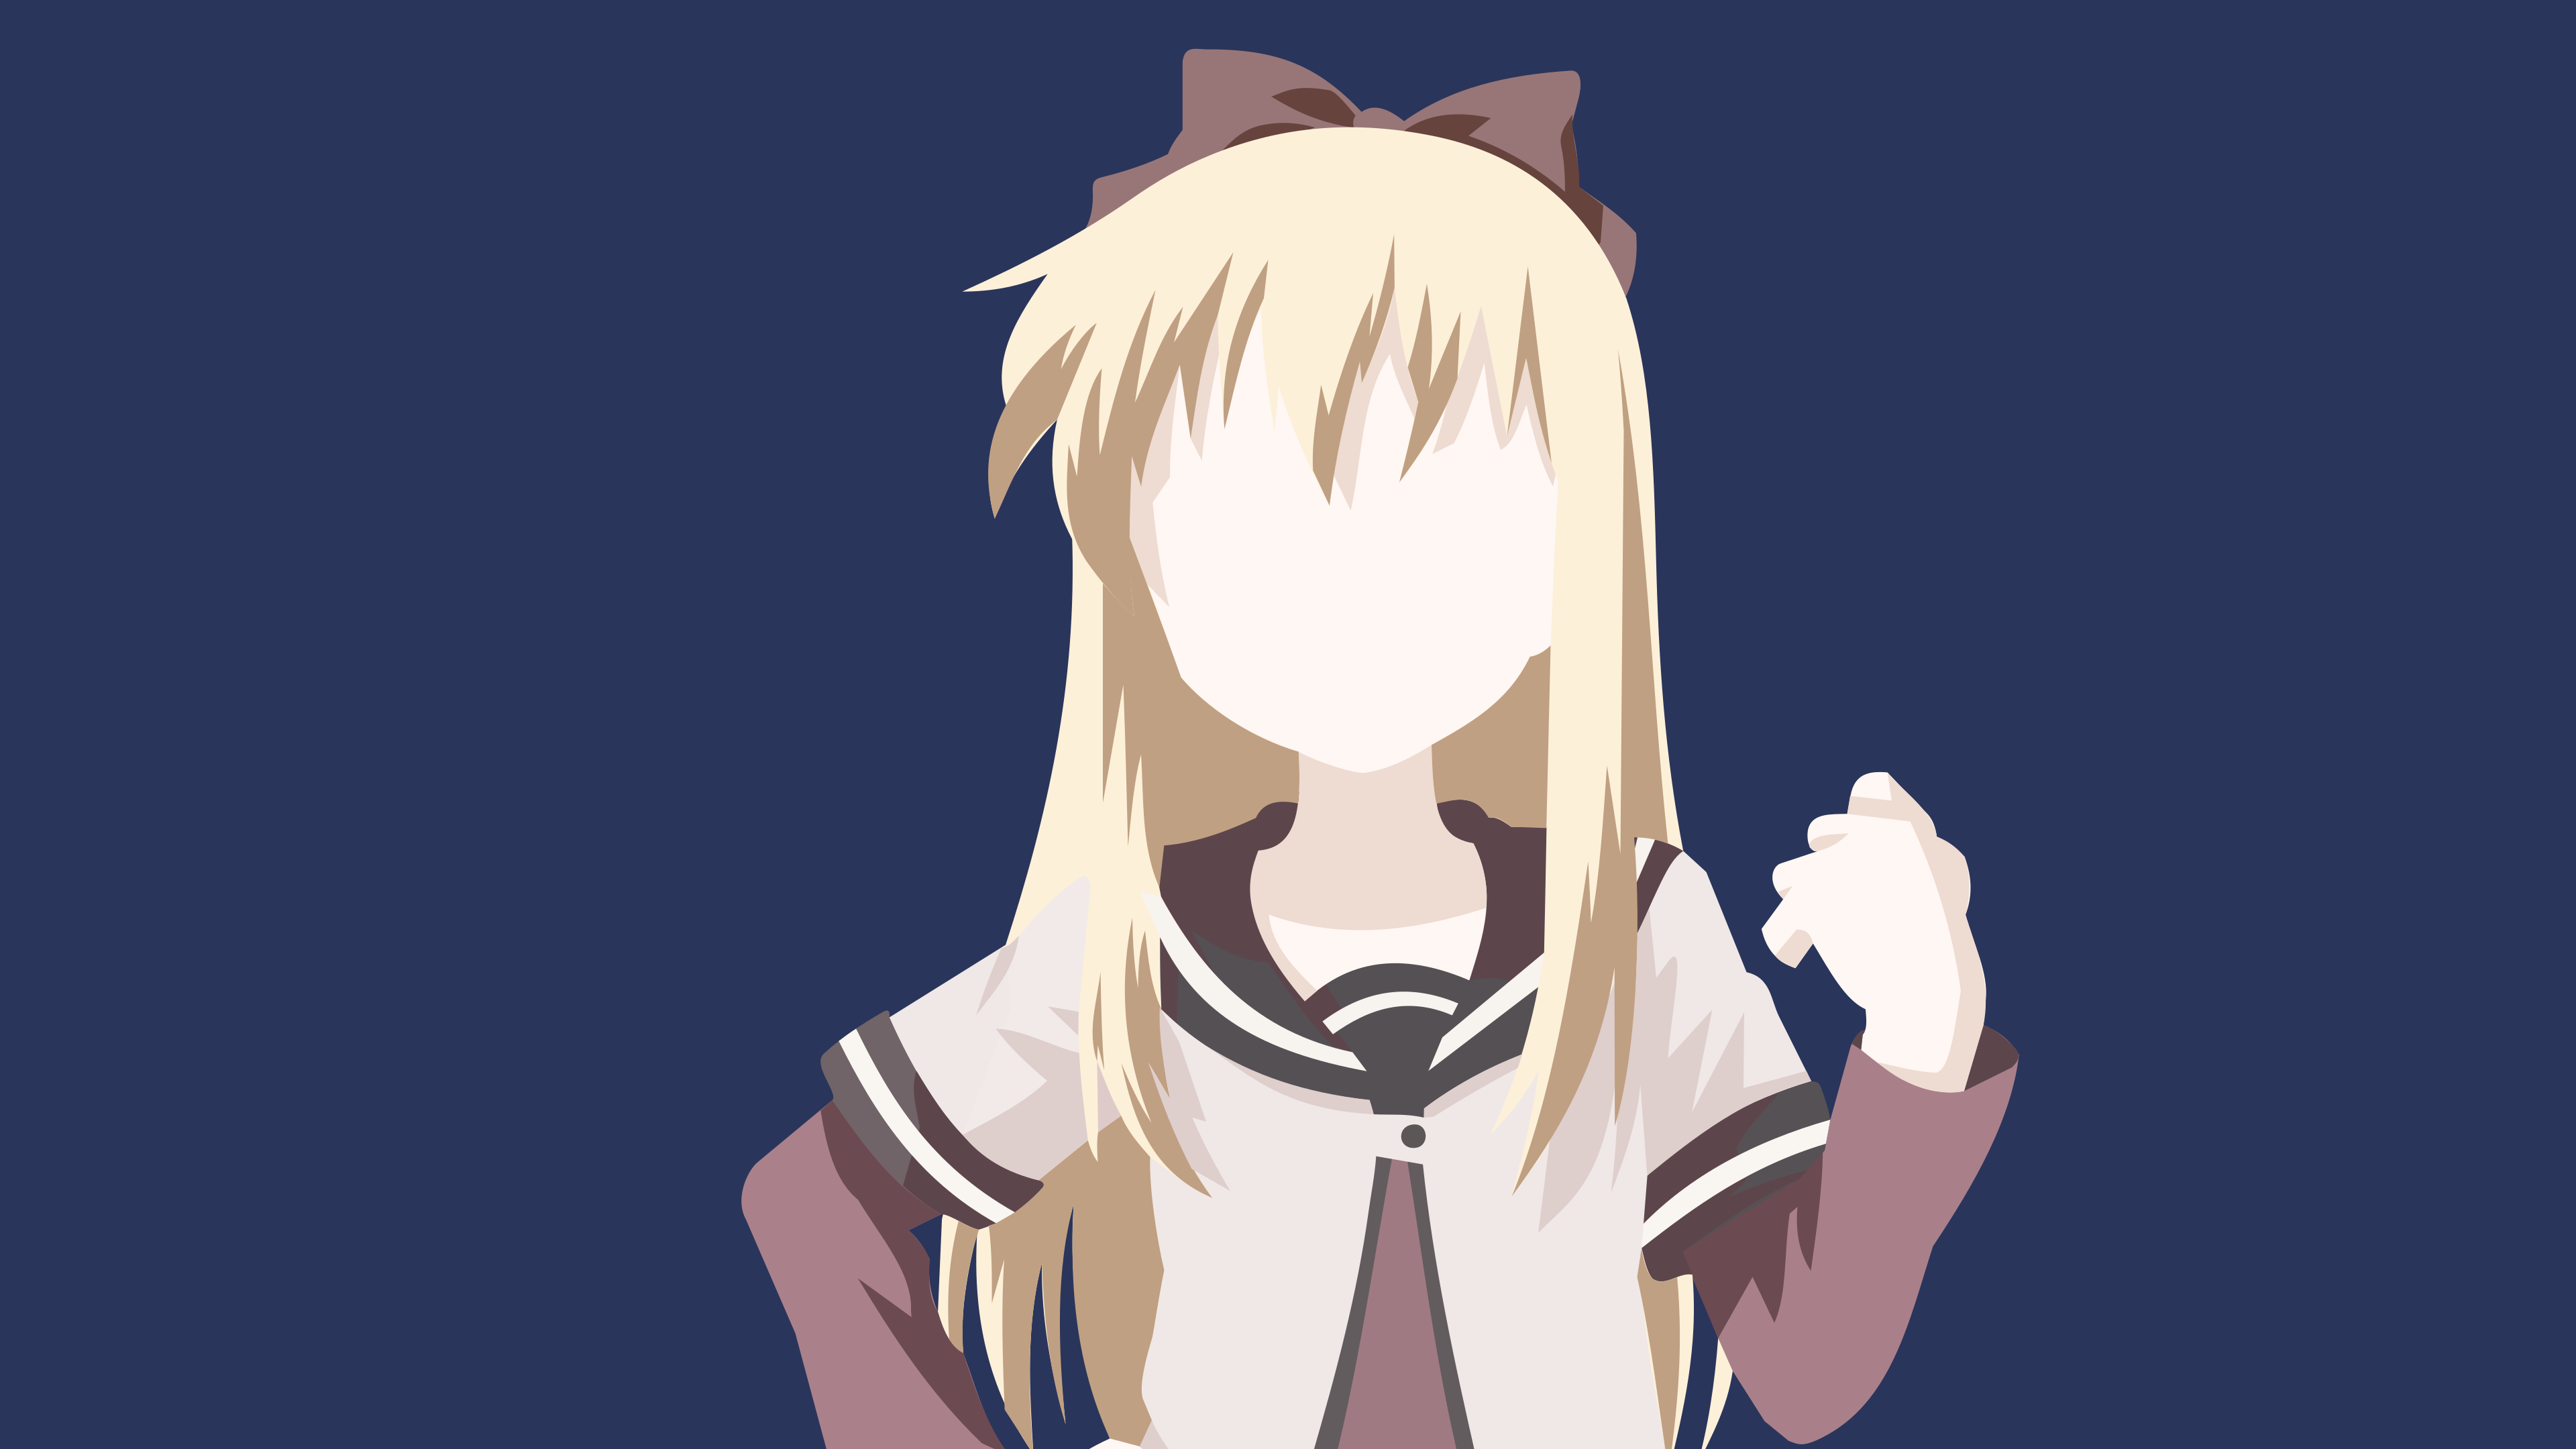 Yuru Yuri On Minimalistic Animoo